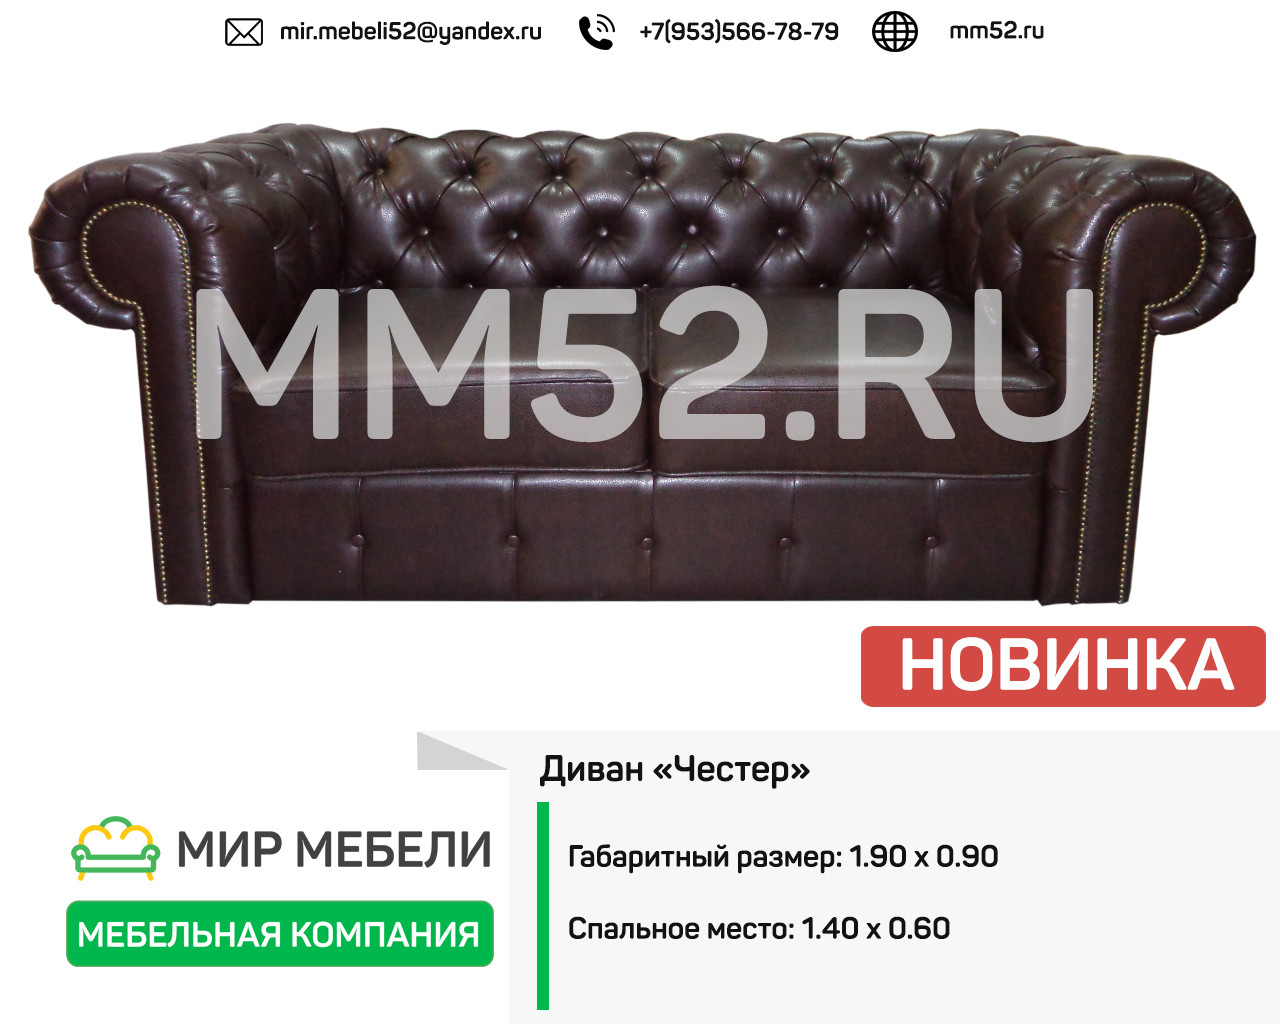 каталог мягкой мебели от производителя мир мебели нижний новгород